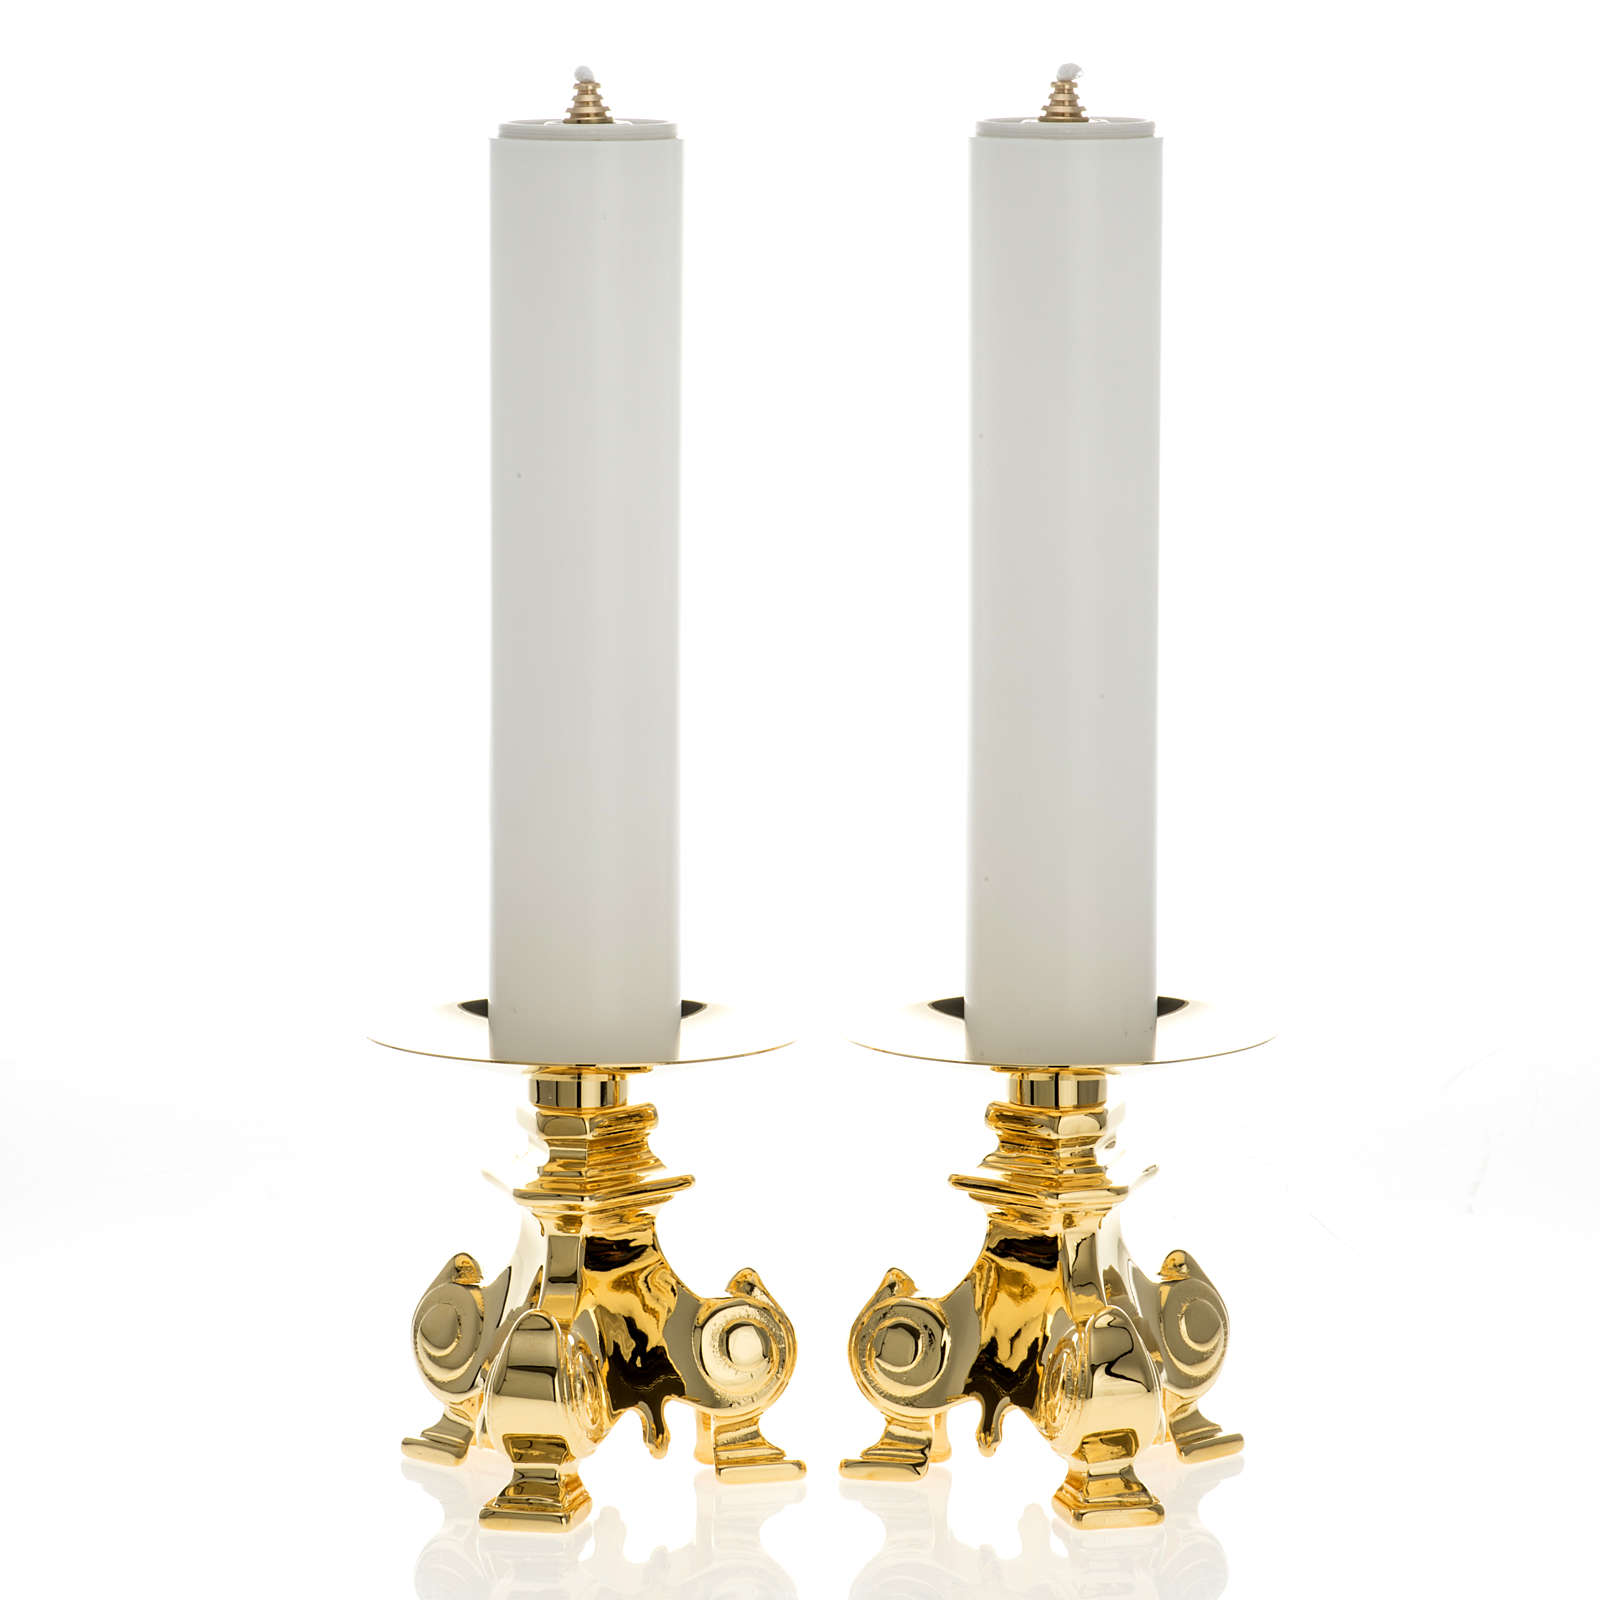 Candelieri ottone e finte candele 4